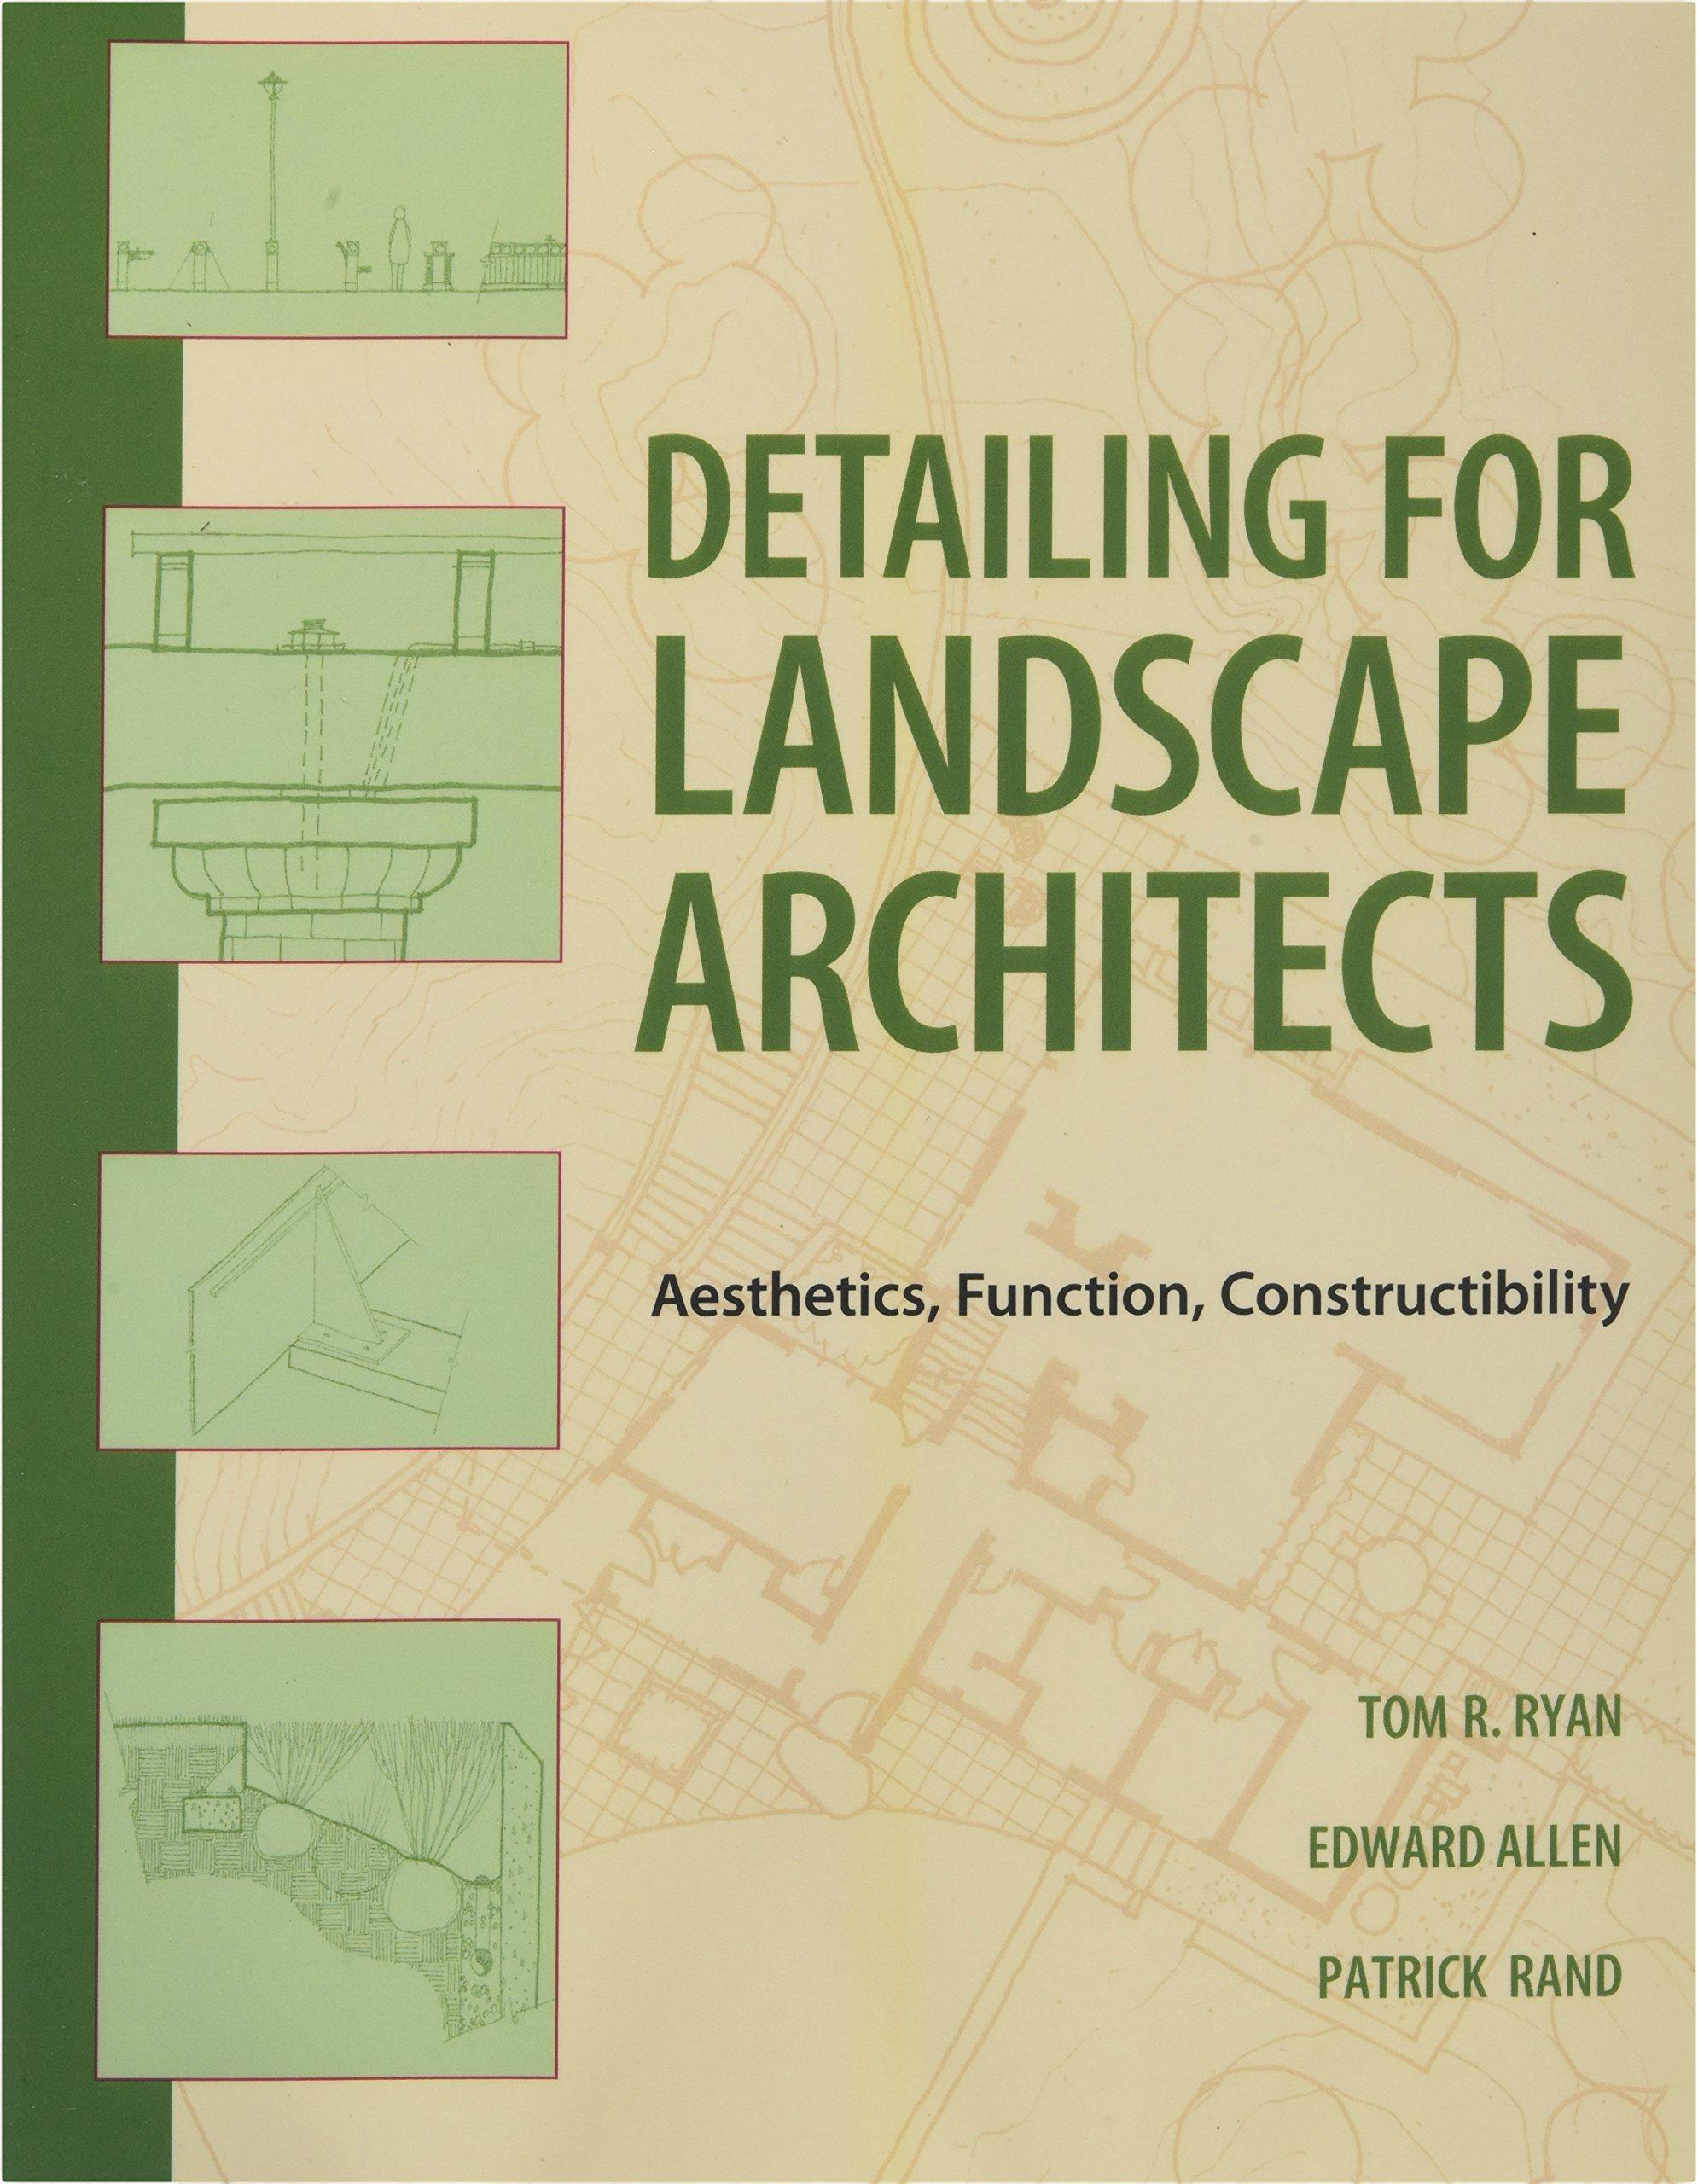 Detailing for landscape architects aesthetics function constructibility thomas r ryan edward allen patrick j rand 9780470548783 architecture